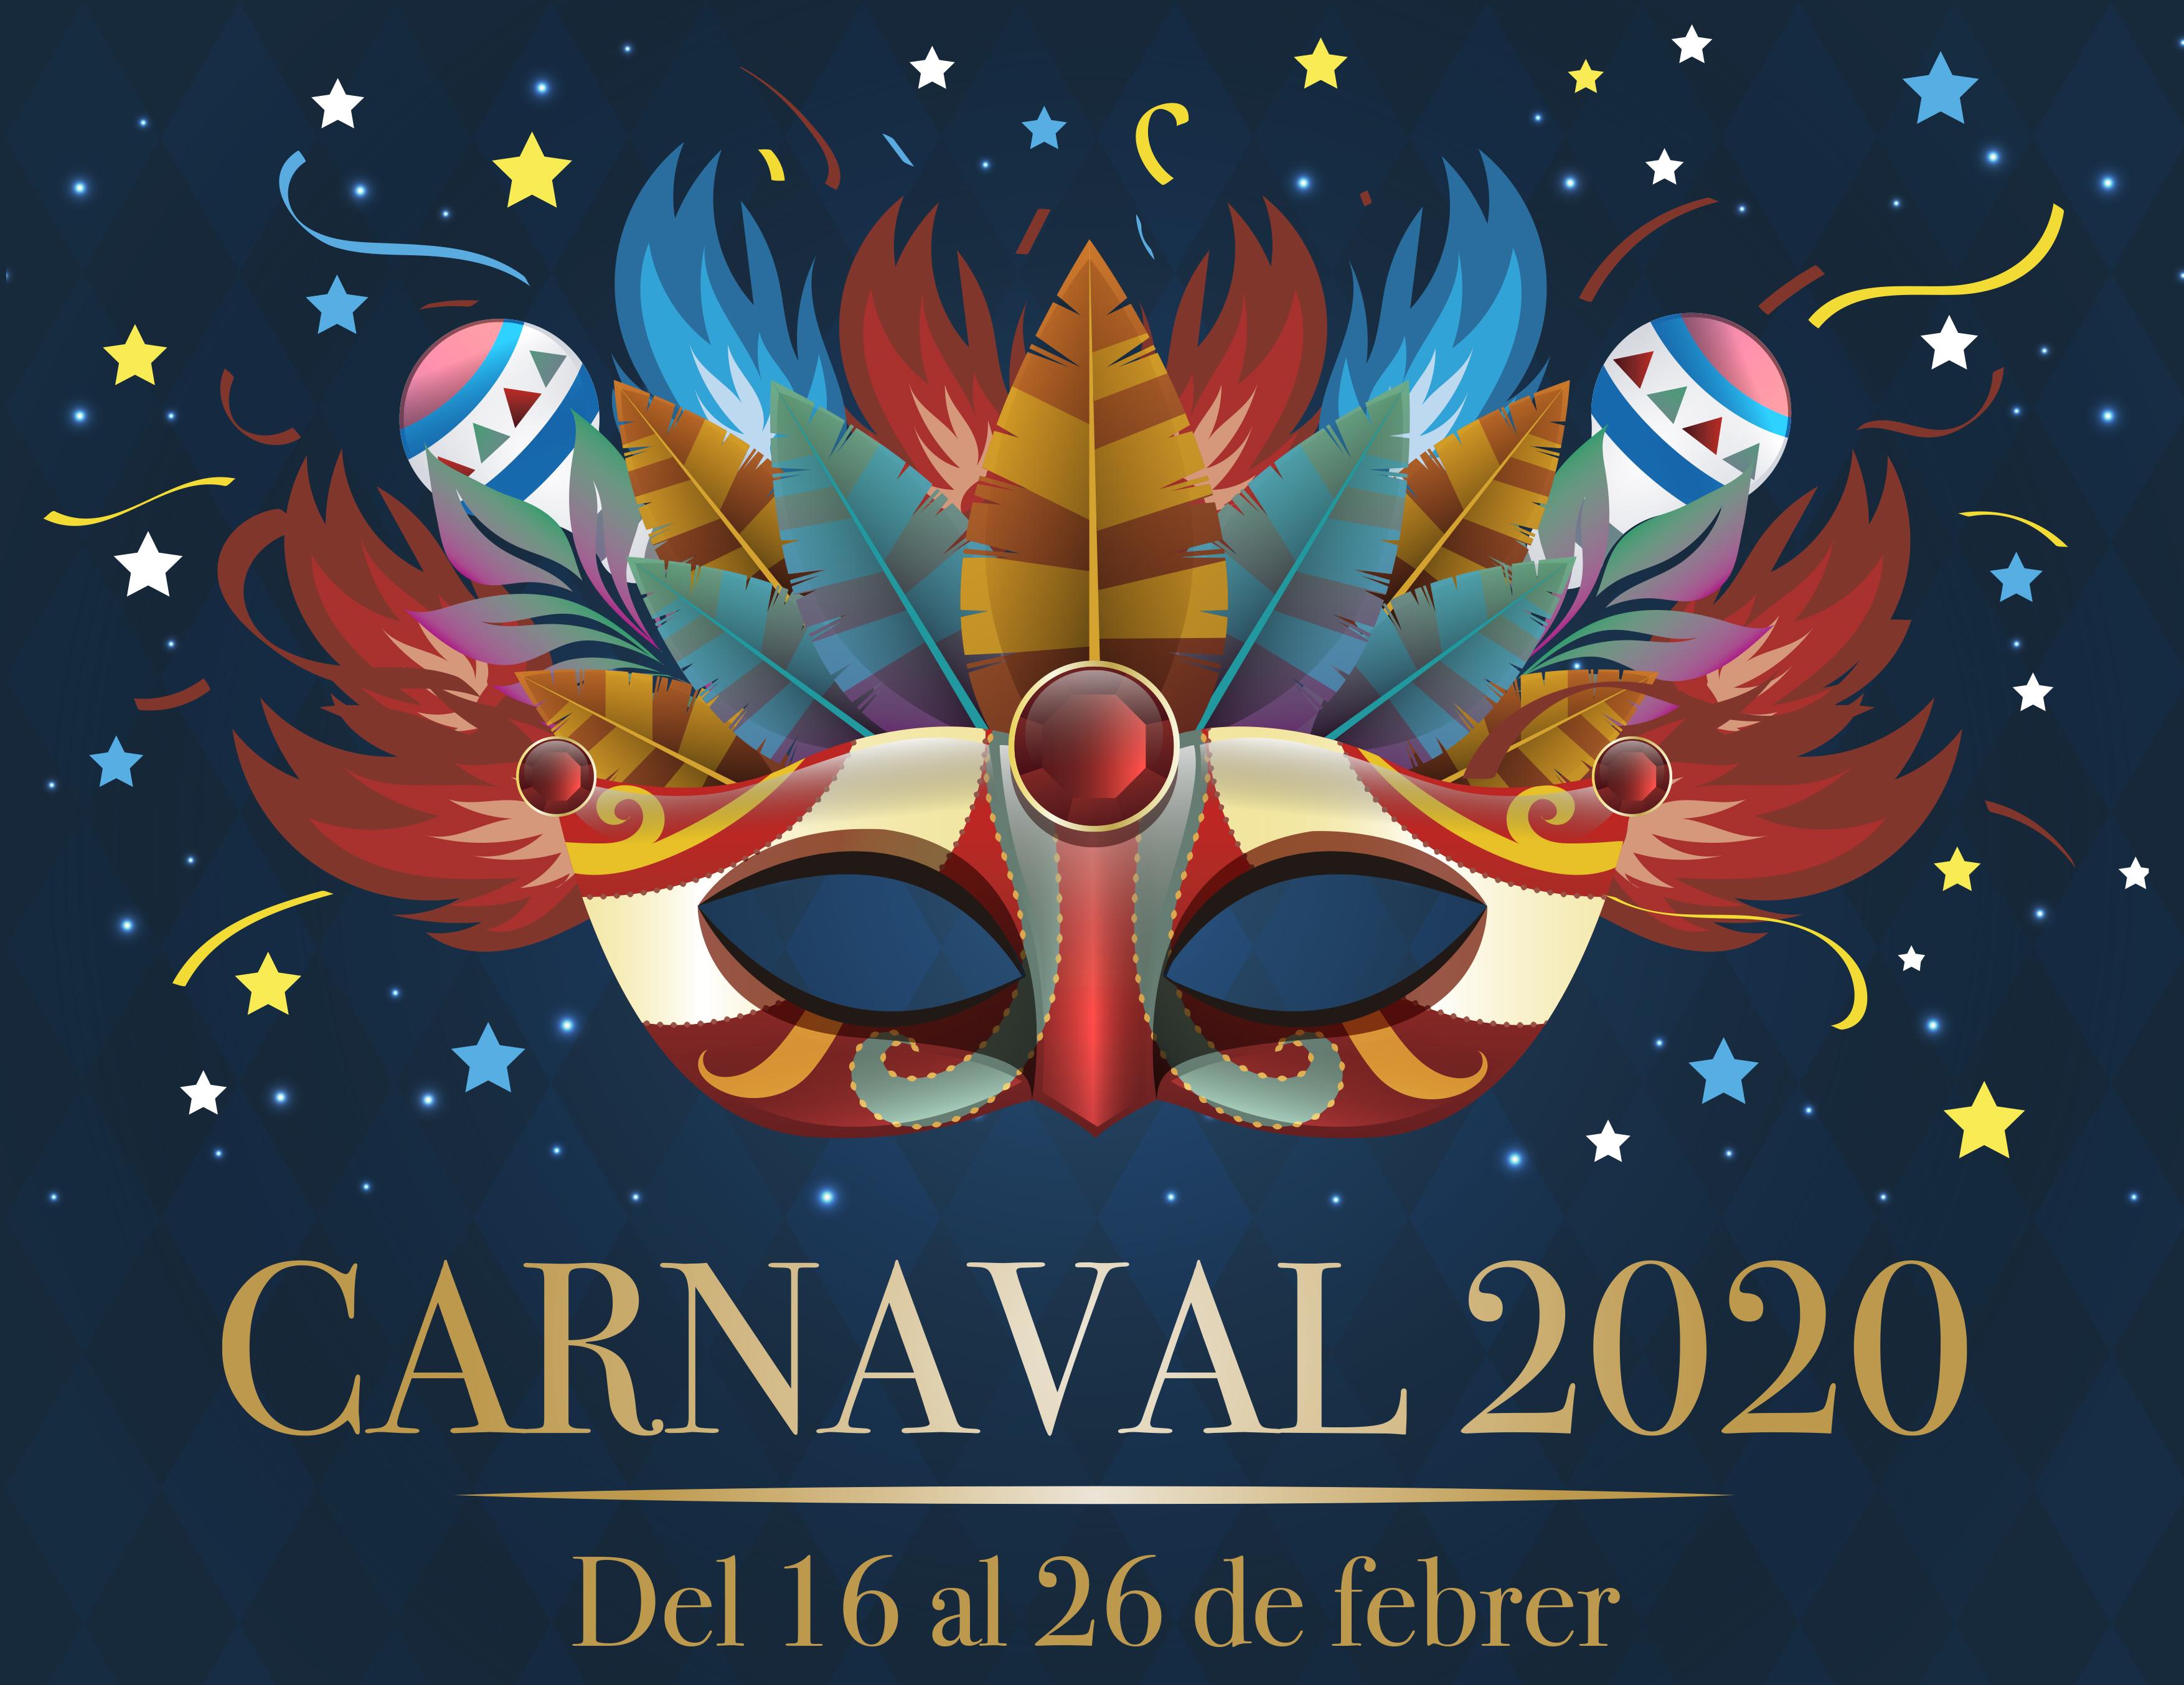 Carnaval en Llavaneras